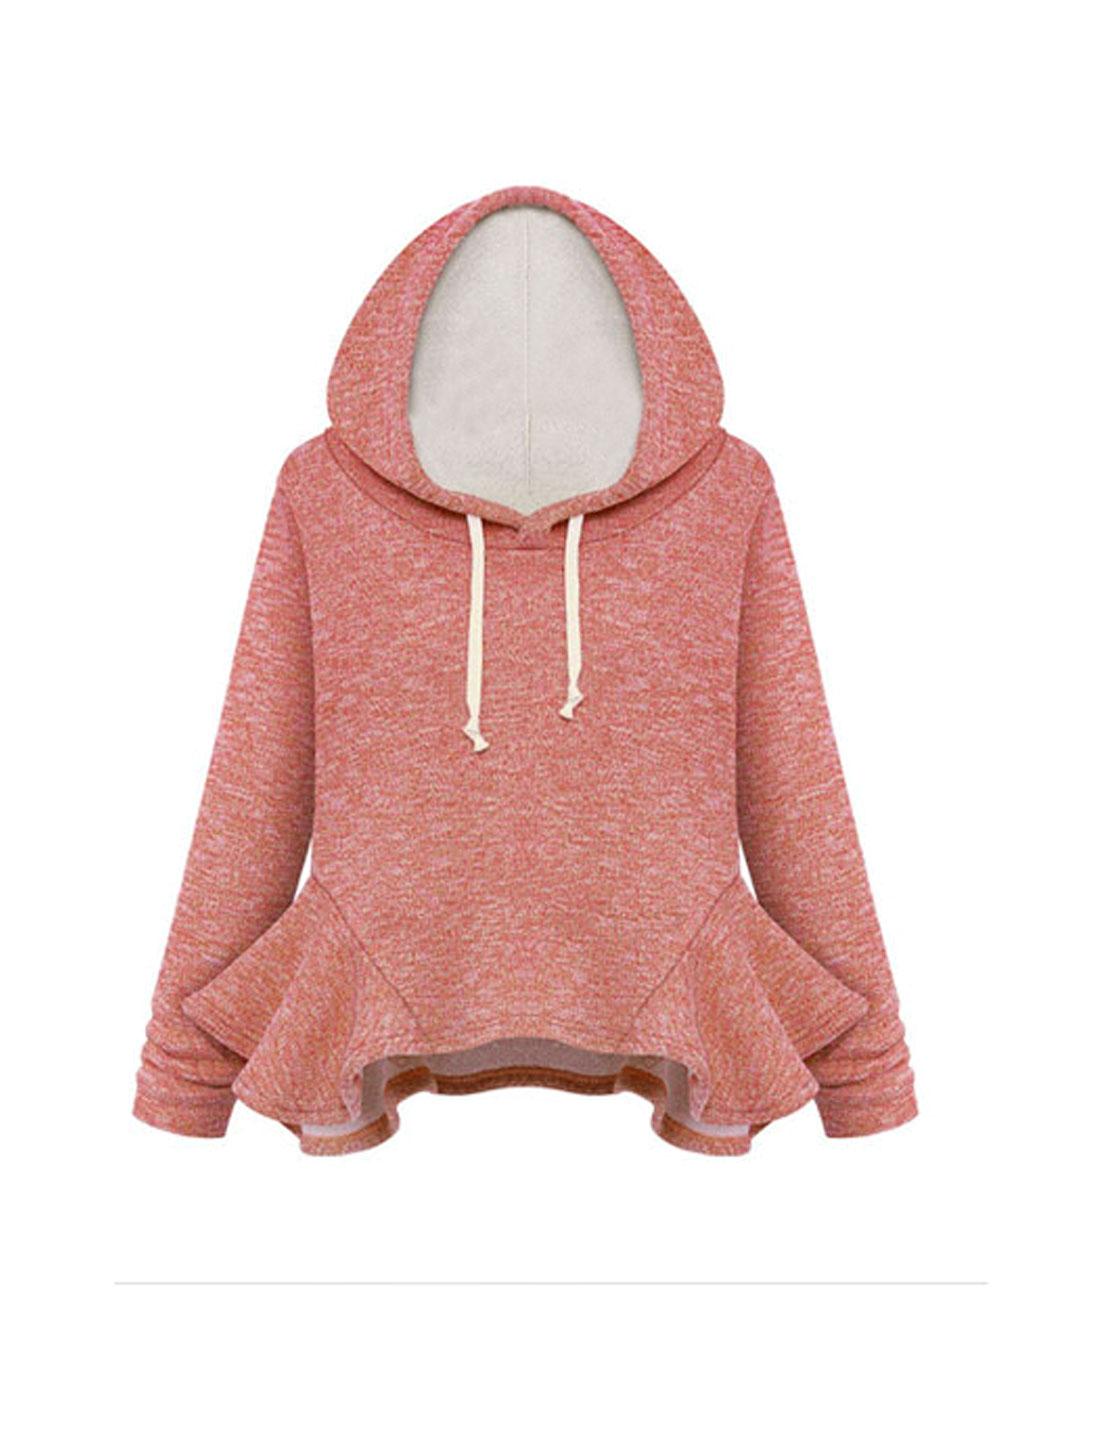 Ladies Drawstring Detail Pullover Warm Red Hooded Sweatshirt S